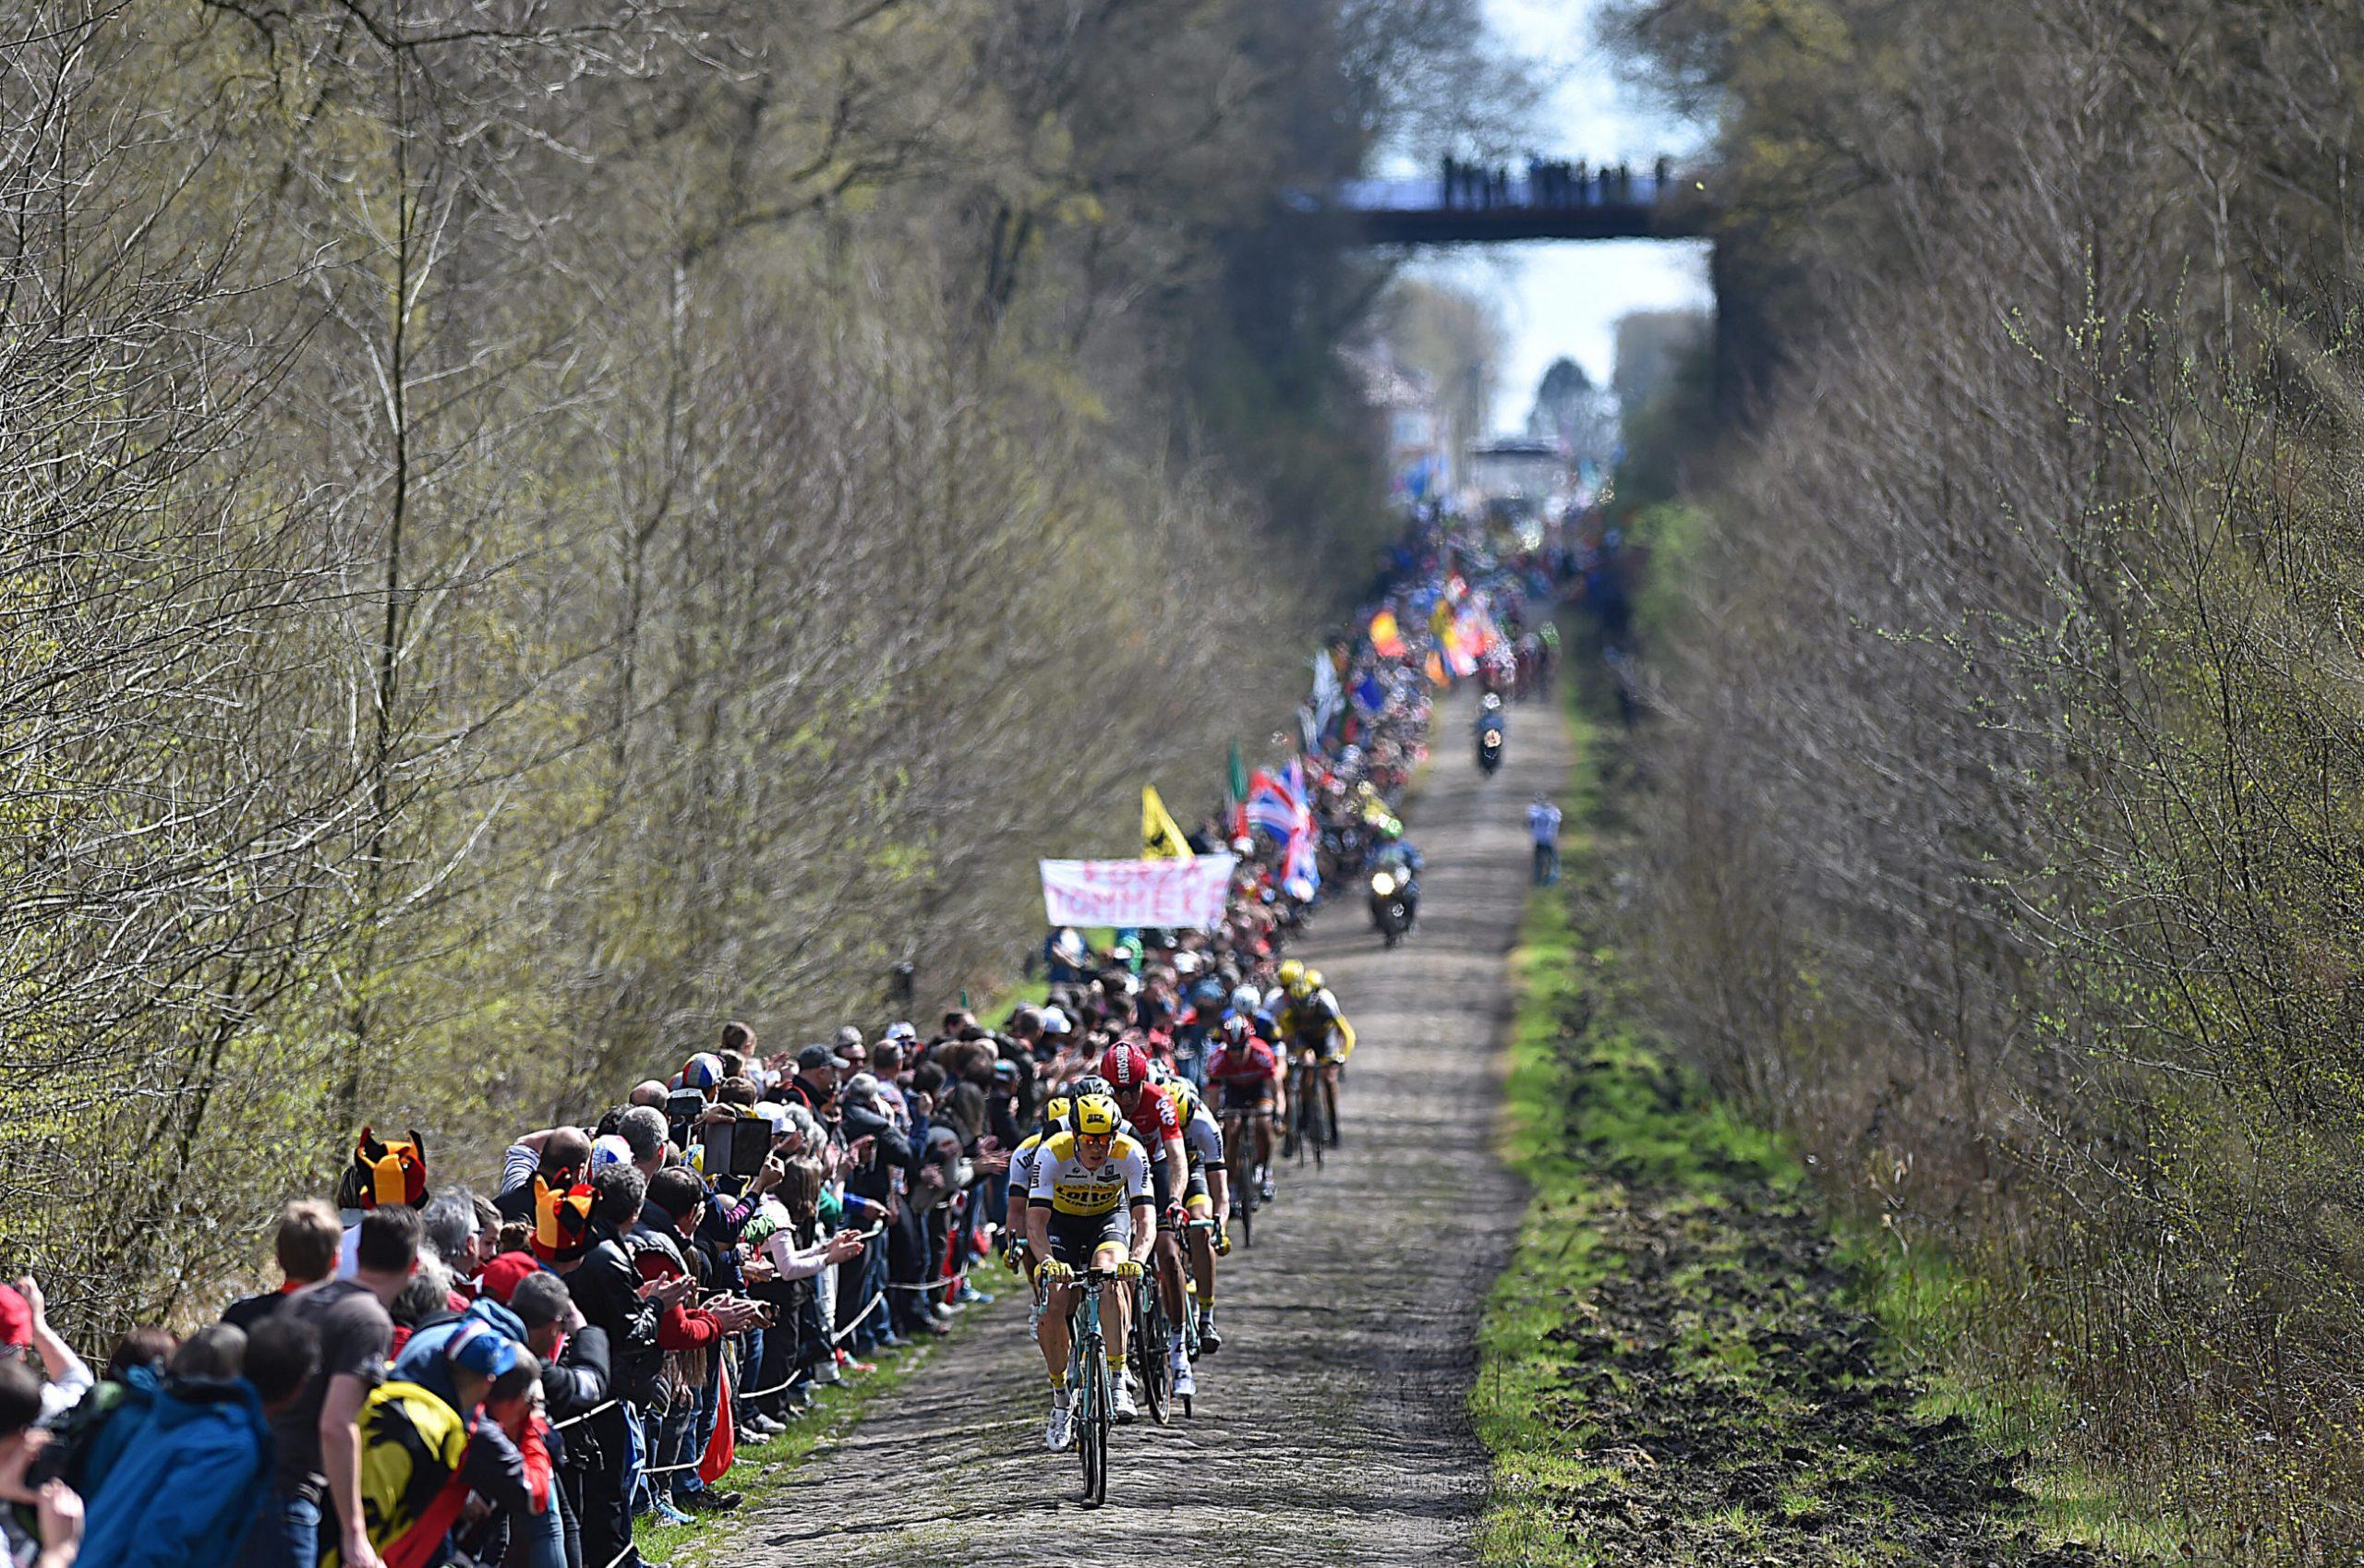 ASO-sjefen tror Paris-Roubaix blir avlyst